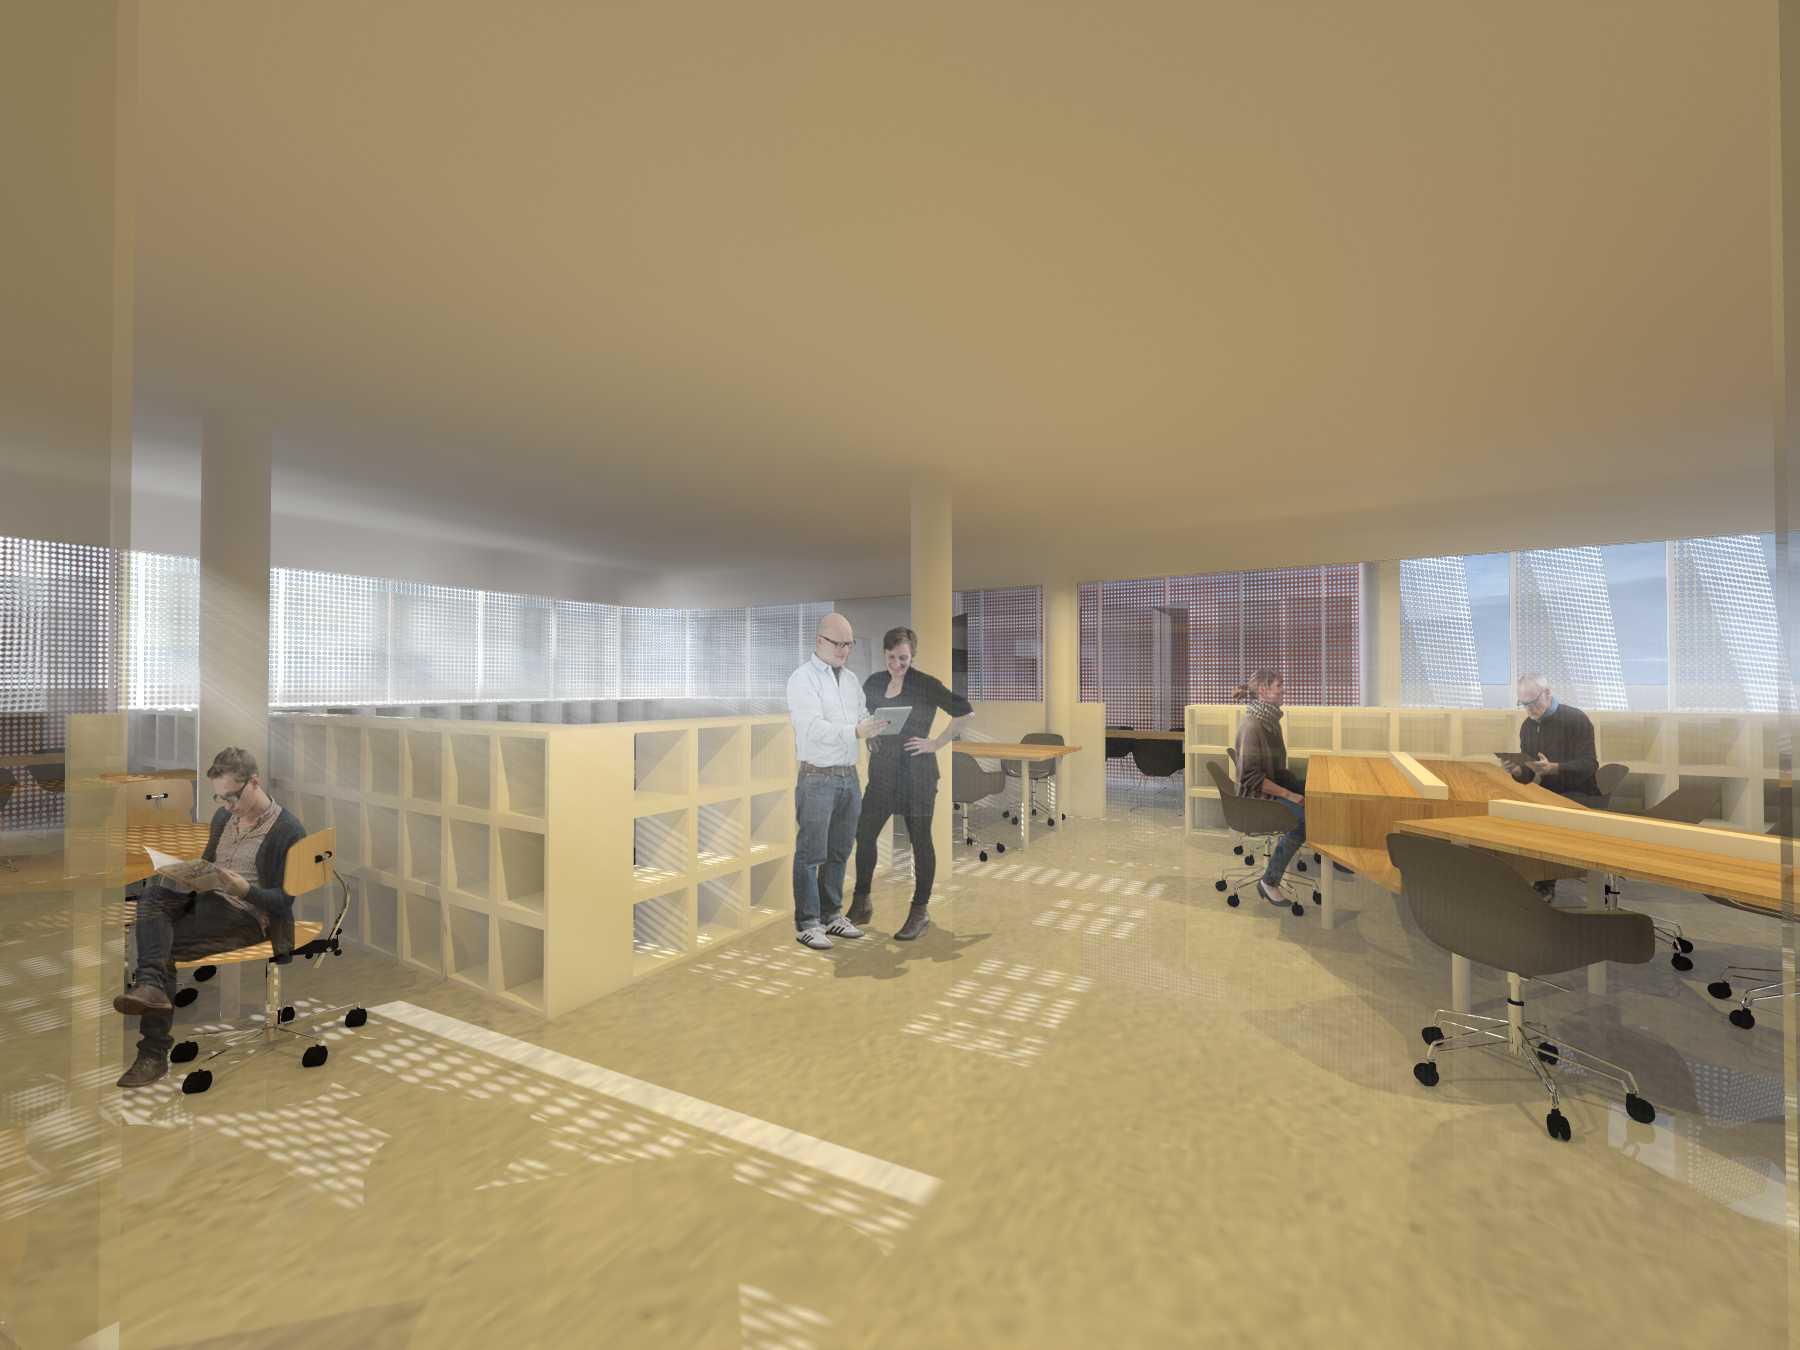 Monokroma Architect Eku Headquarter Jakarta Jakarta 6-Staff-Room Modern  14791